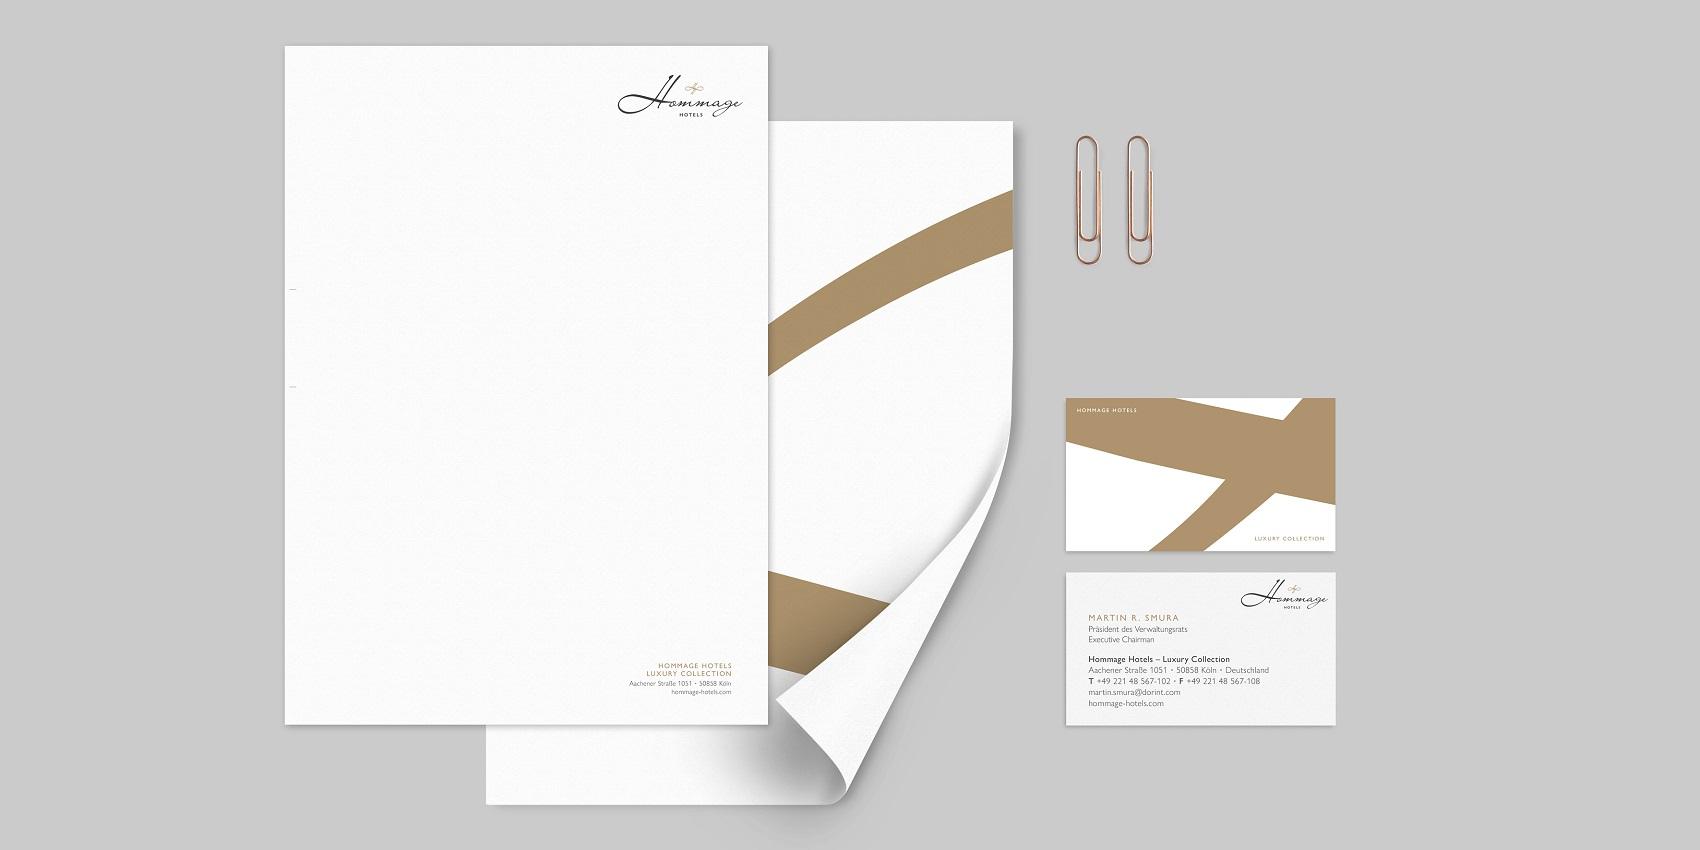 Hommage Hotels: Corporate Design - Werbung